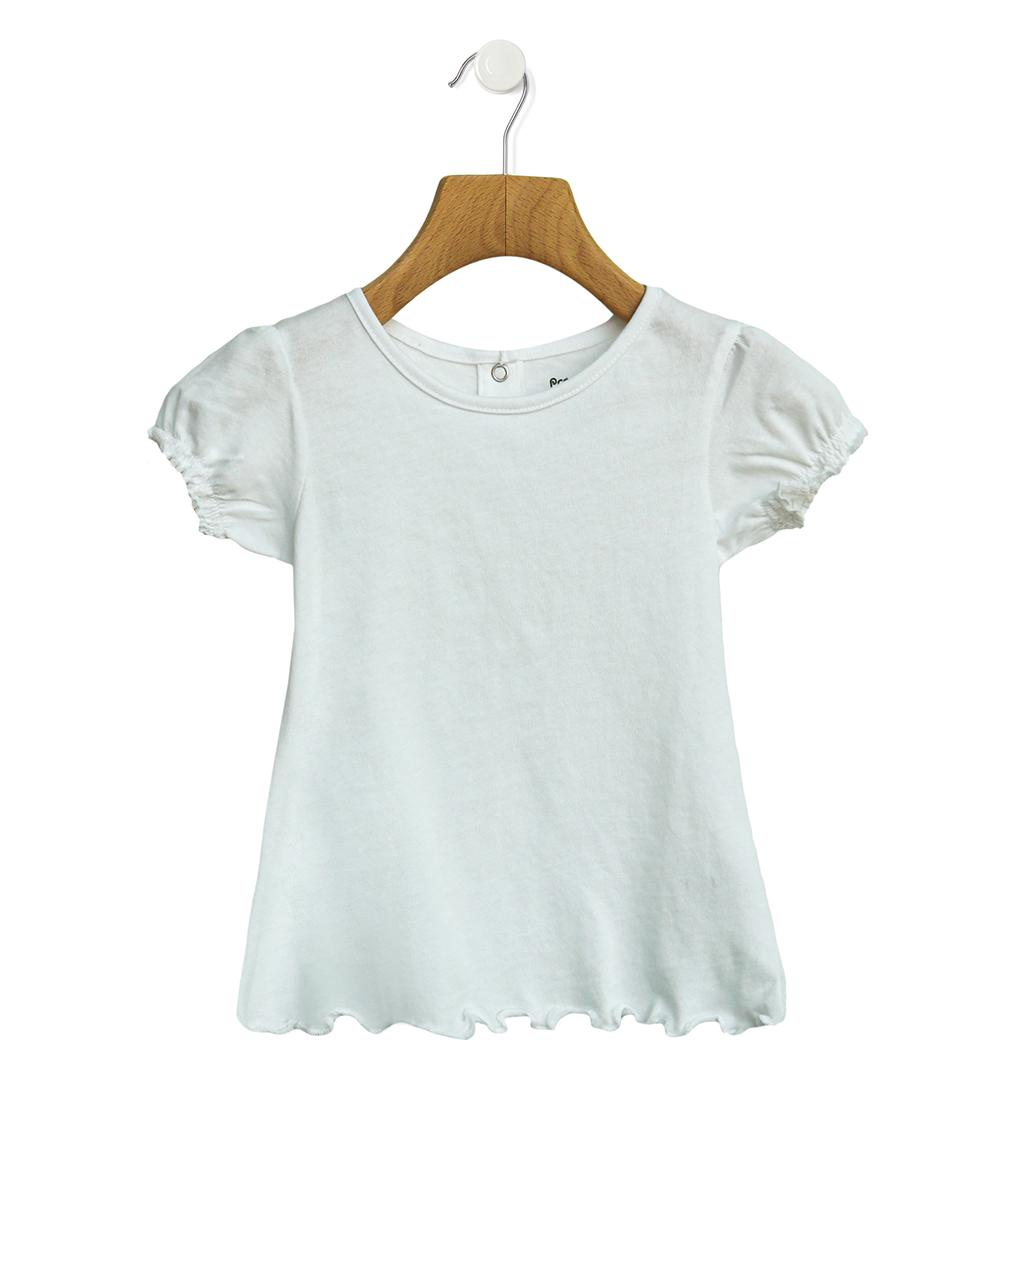 T-Shirt Κοντομάνικο Μονόχρωμο για Κορίτσι